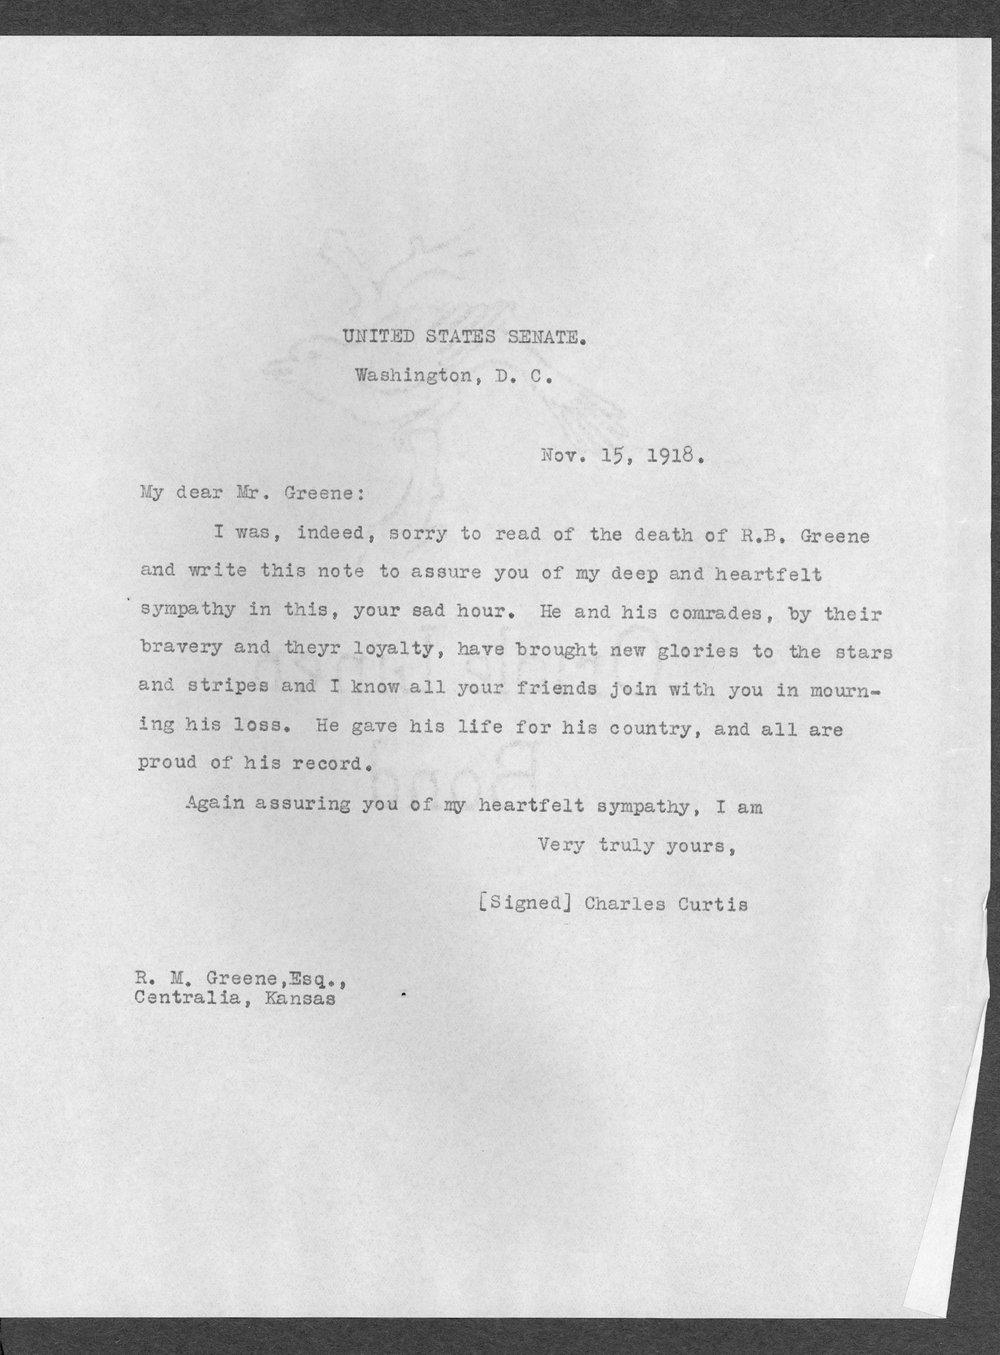 Robert Bryan Greene, World War I soldier - 35